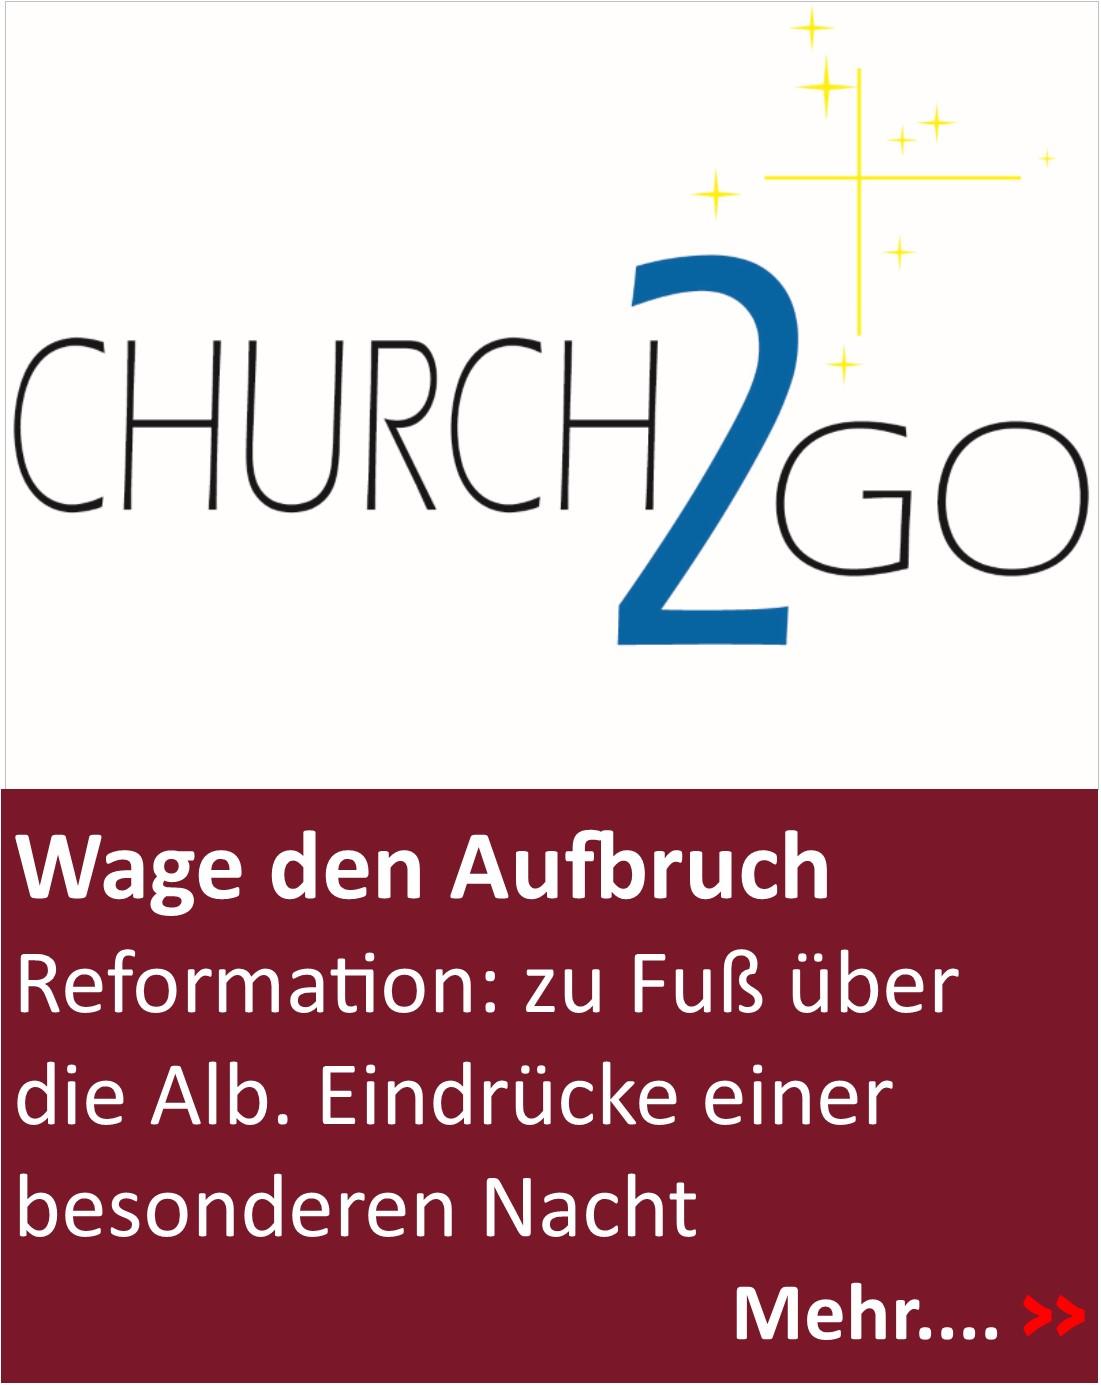 aktuell_kurz_churchtogo